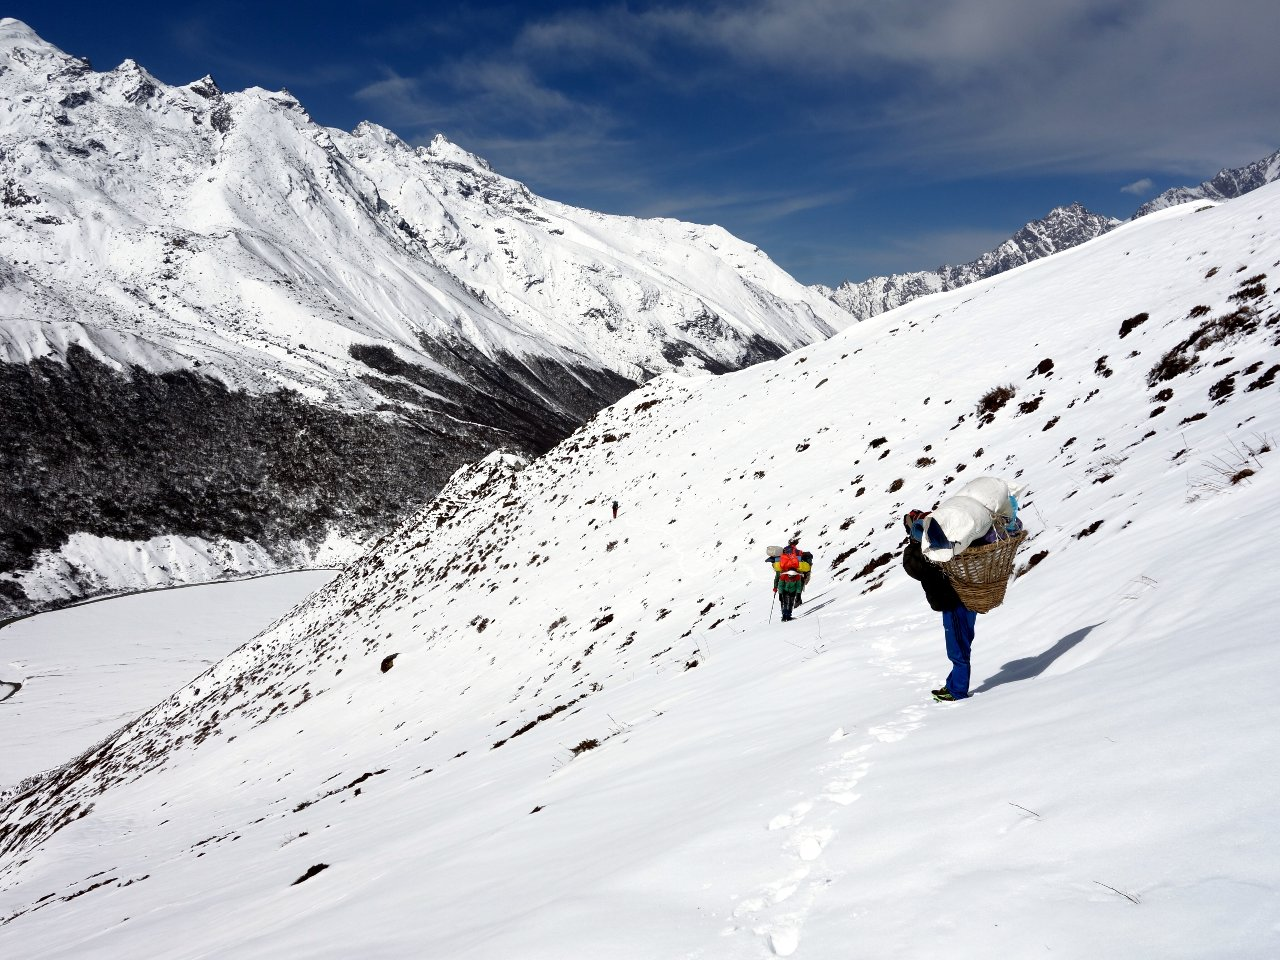 Porters traversing Tserko Ri on the way to Yala Peak base camp